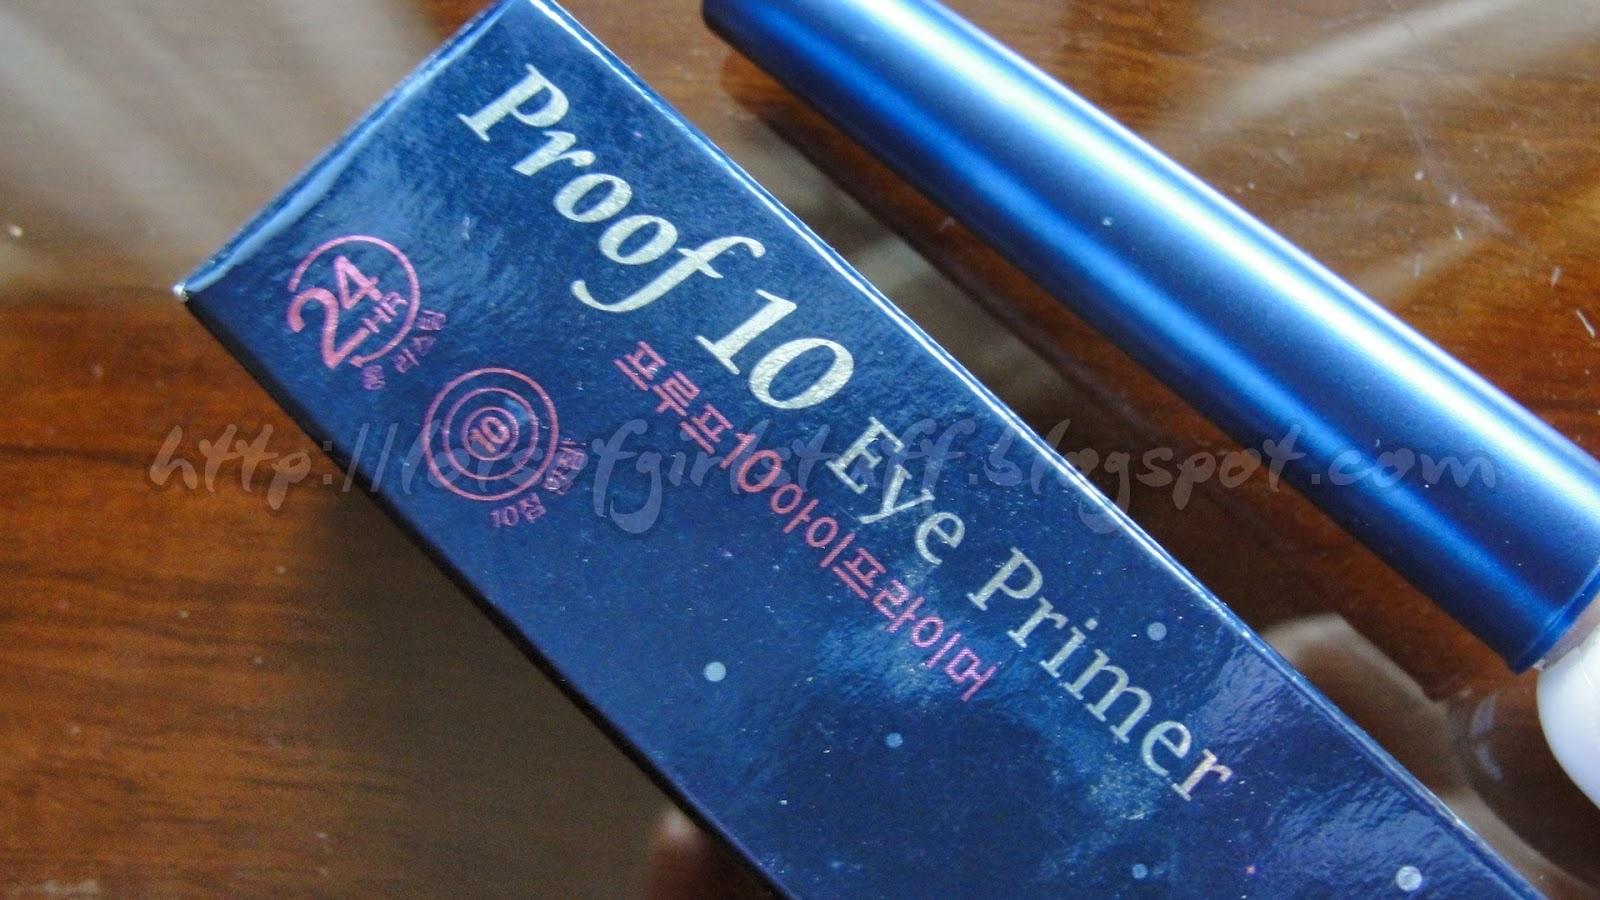 Proof 10 Eye Primer by Etude House #13